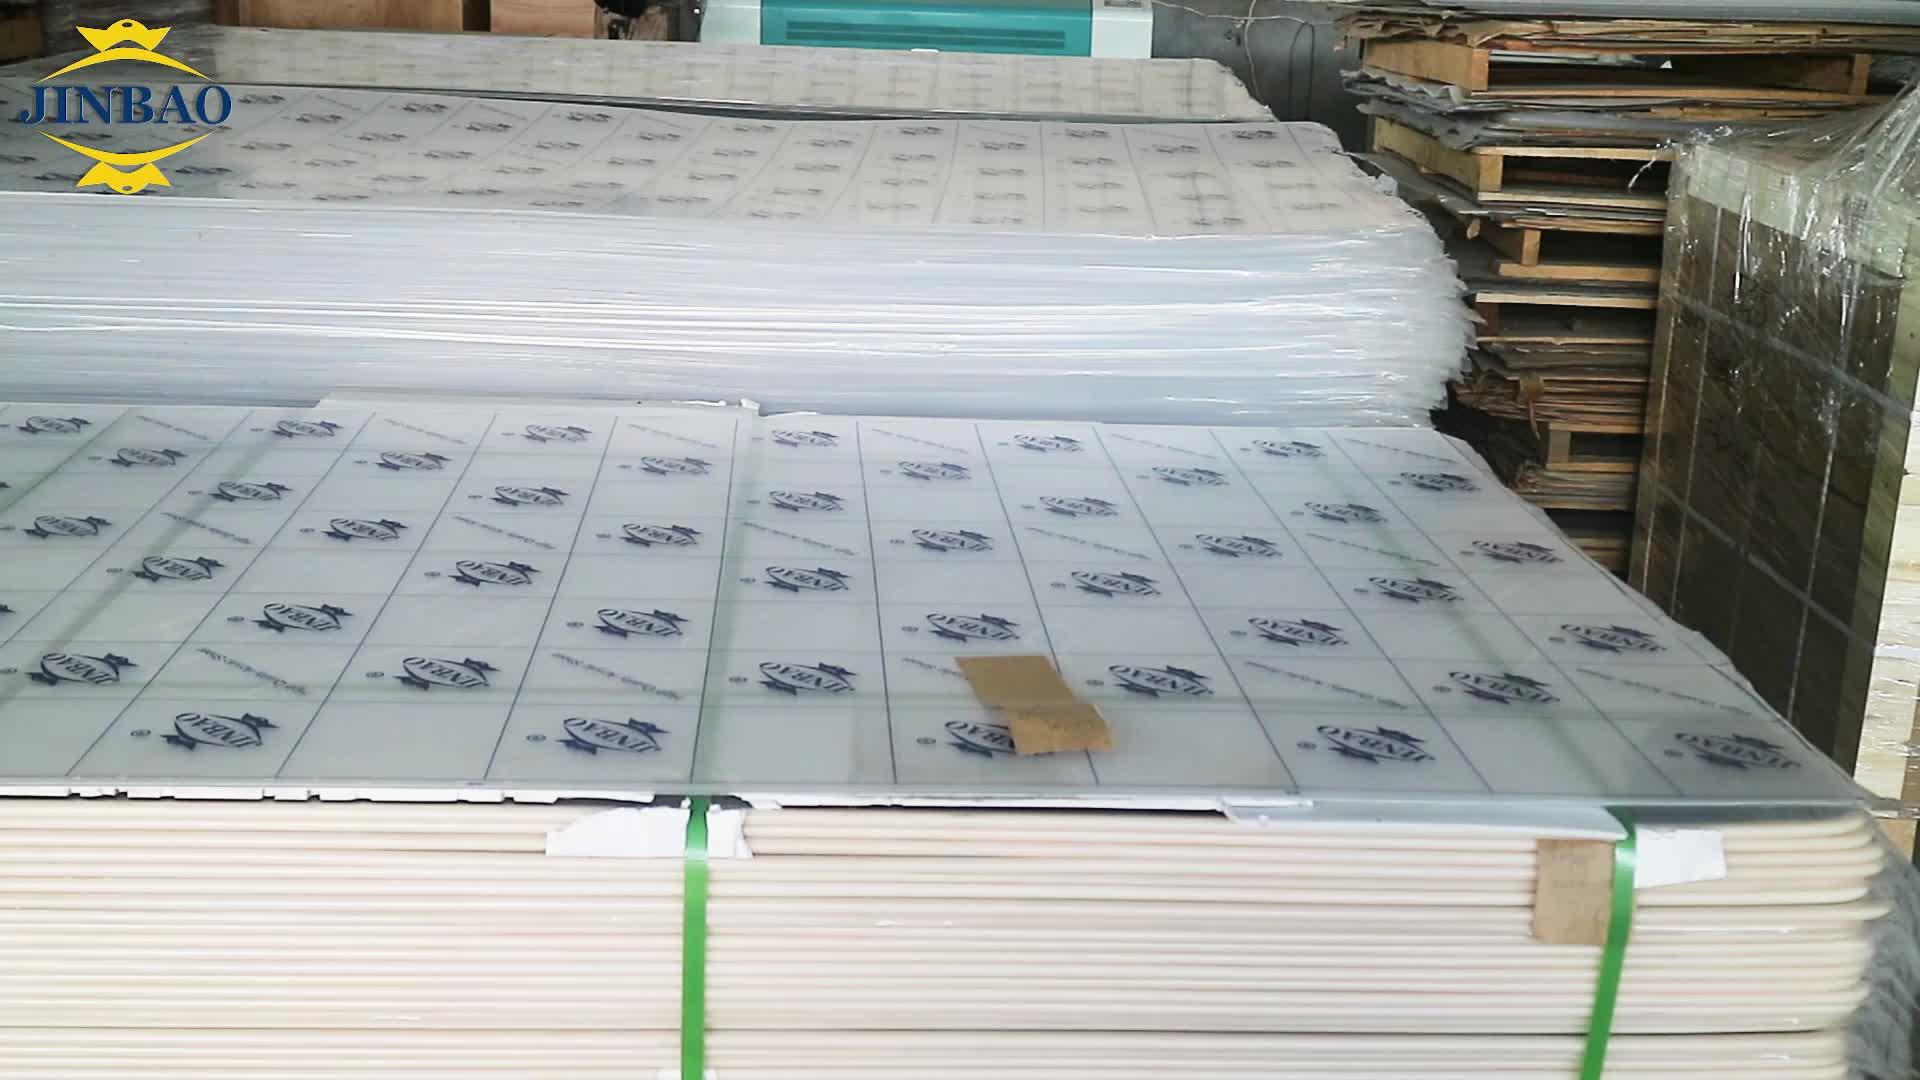 JINBAO transparant clear gegoten acryl glas vel 3mm 4mm plexiglas board reclame prijs